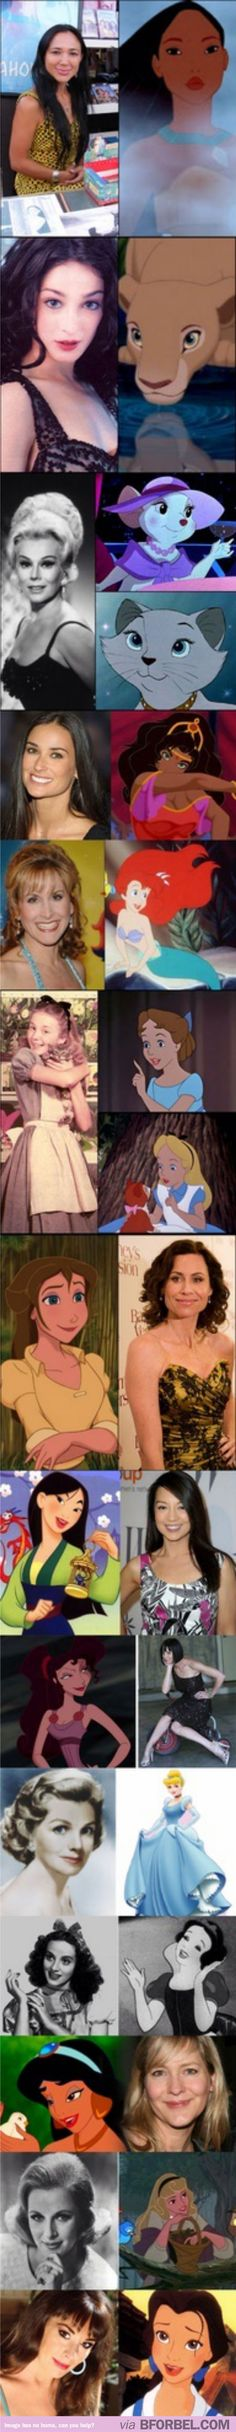 Disney Princesses and their voice actresses. Demi Moore was Esmeralda?!